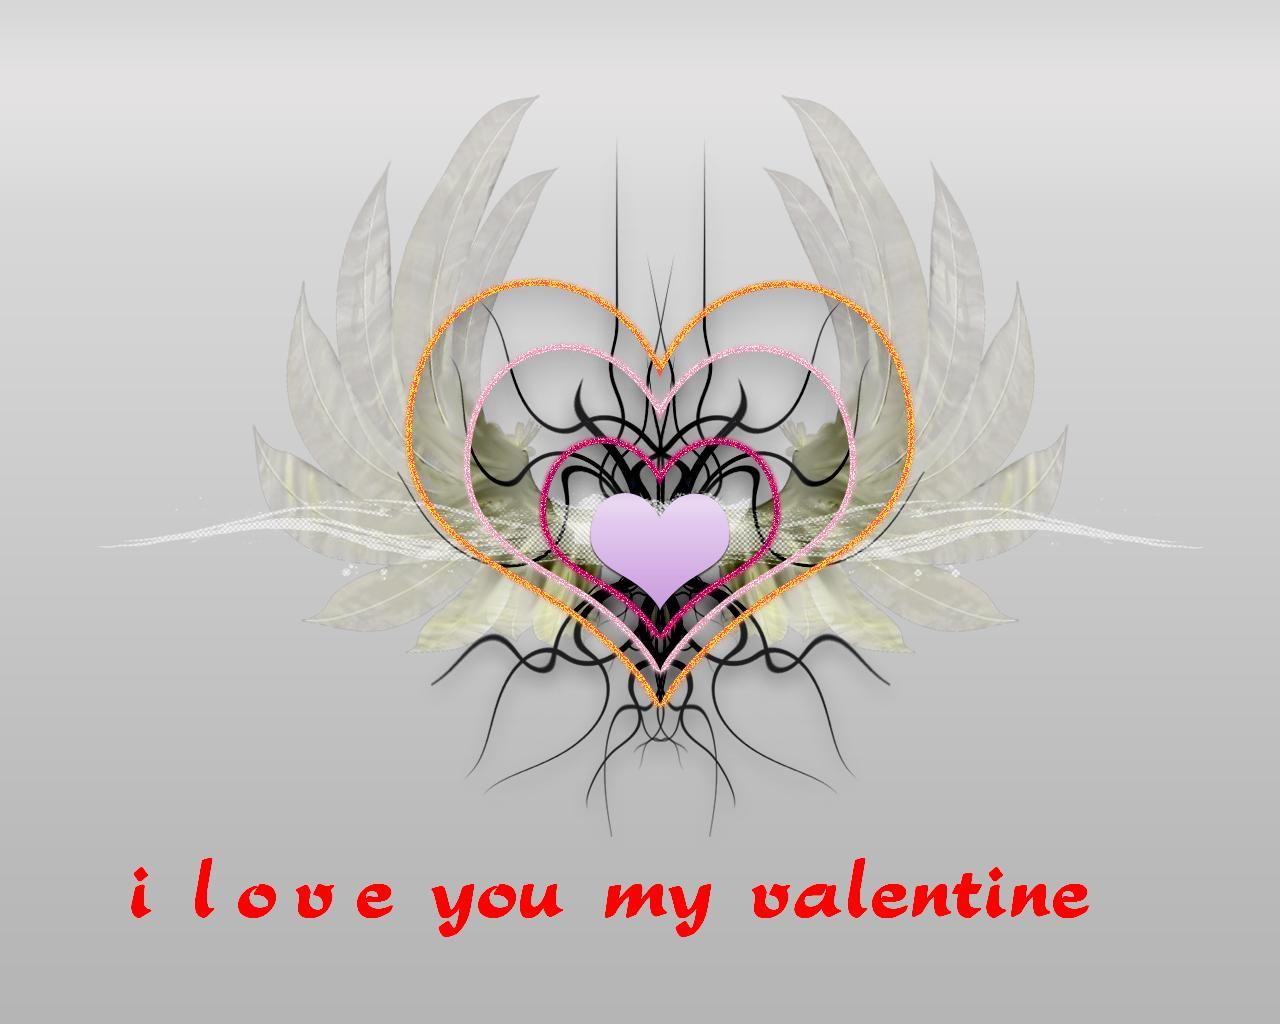 happy valentines day 201314 feb 20132013 valentine day